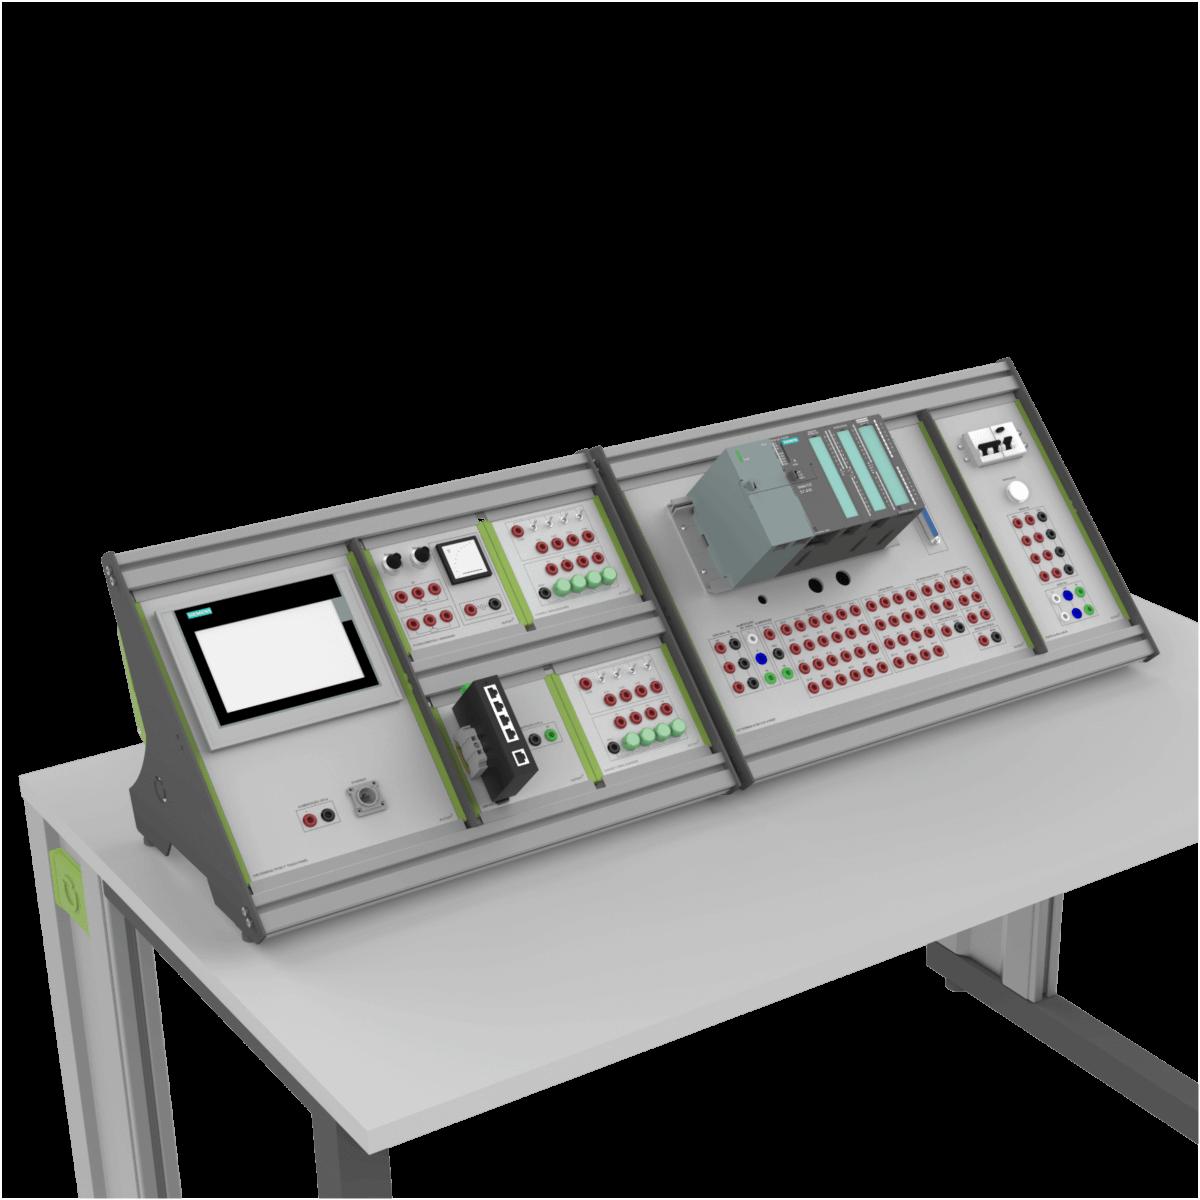 lab-automacao-bancada-didatica-rack-desktop-clp-s7-300_1-auttom-7